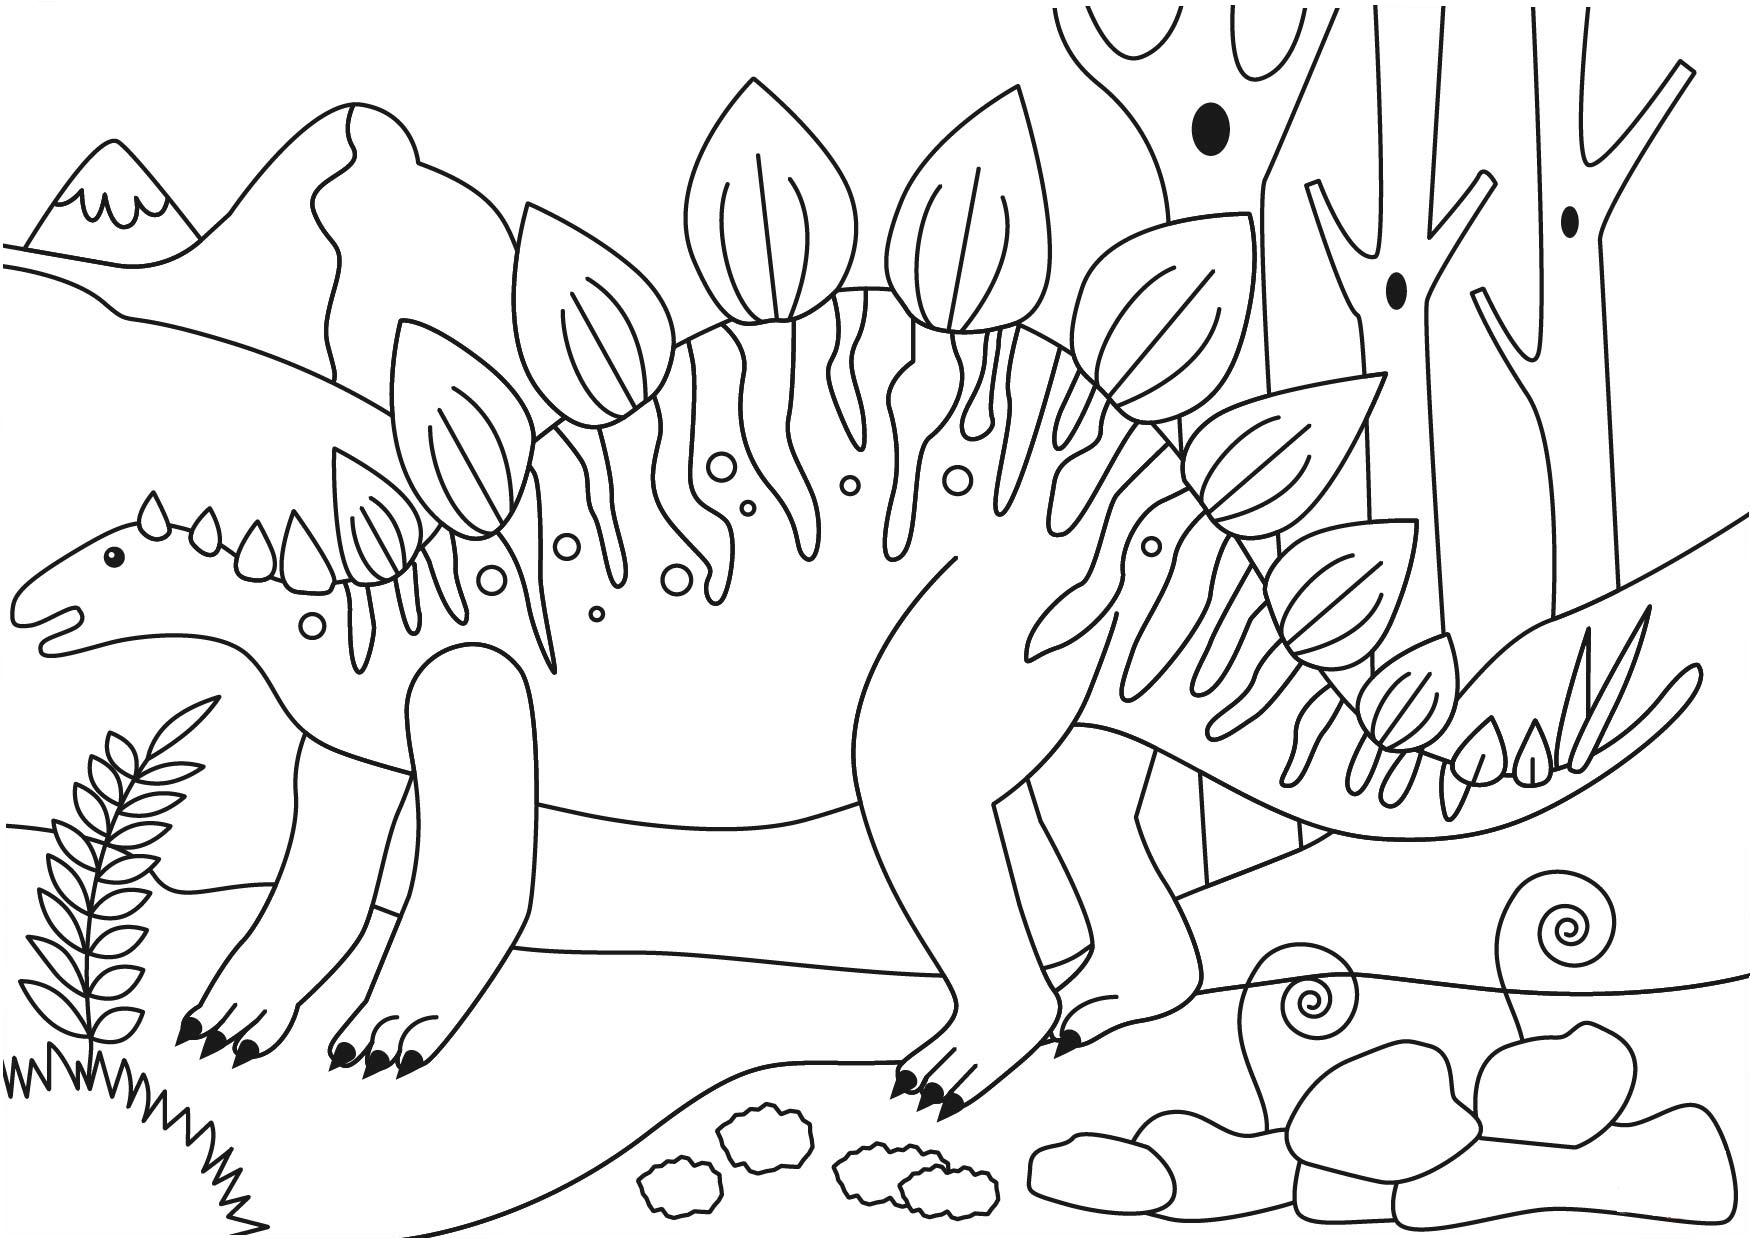 Stegosaurus Dinosaur Coloring Page Dinosaur Coloring Pages Dinosaur Coloring Coloring Pages